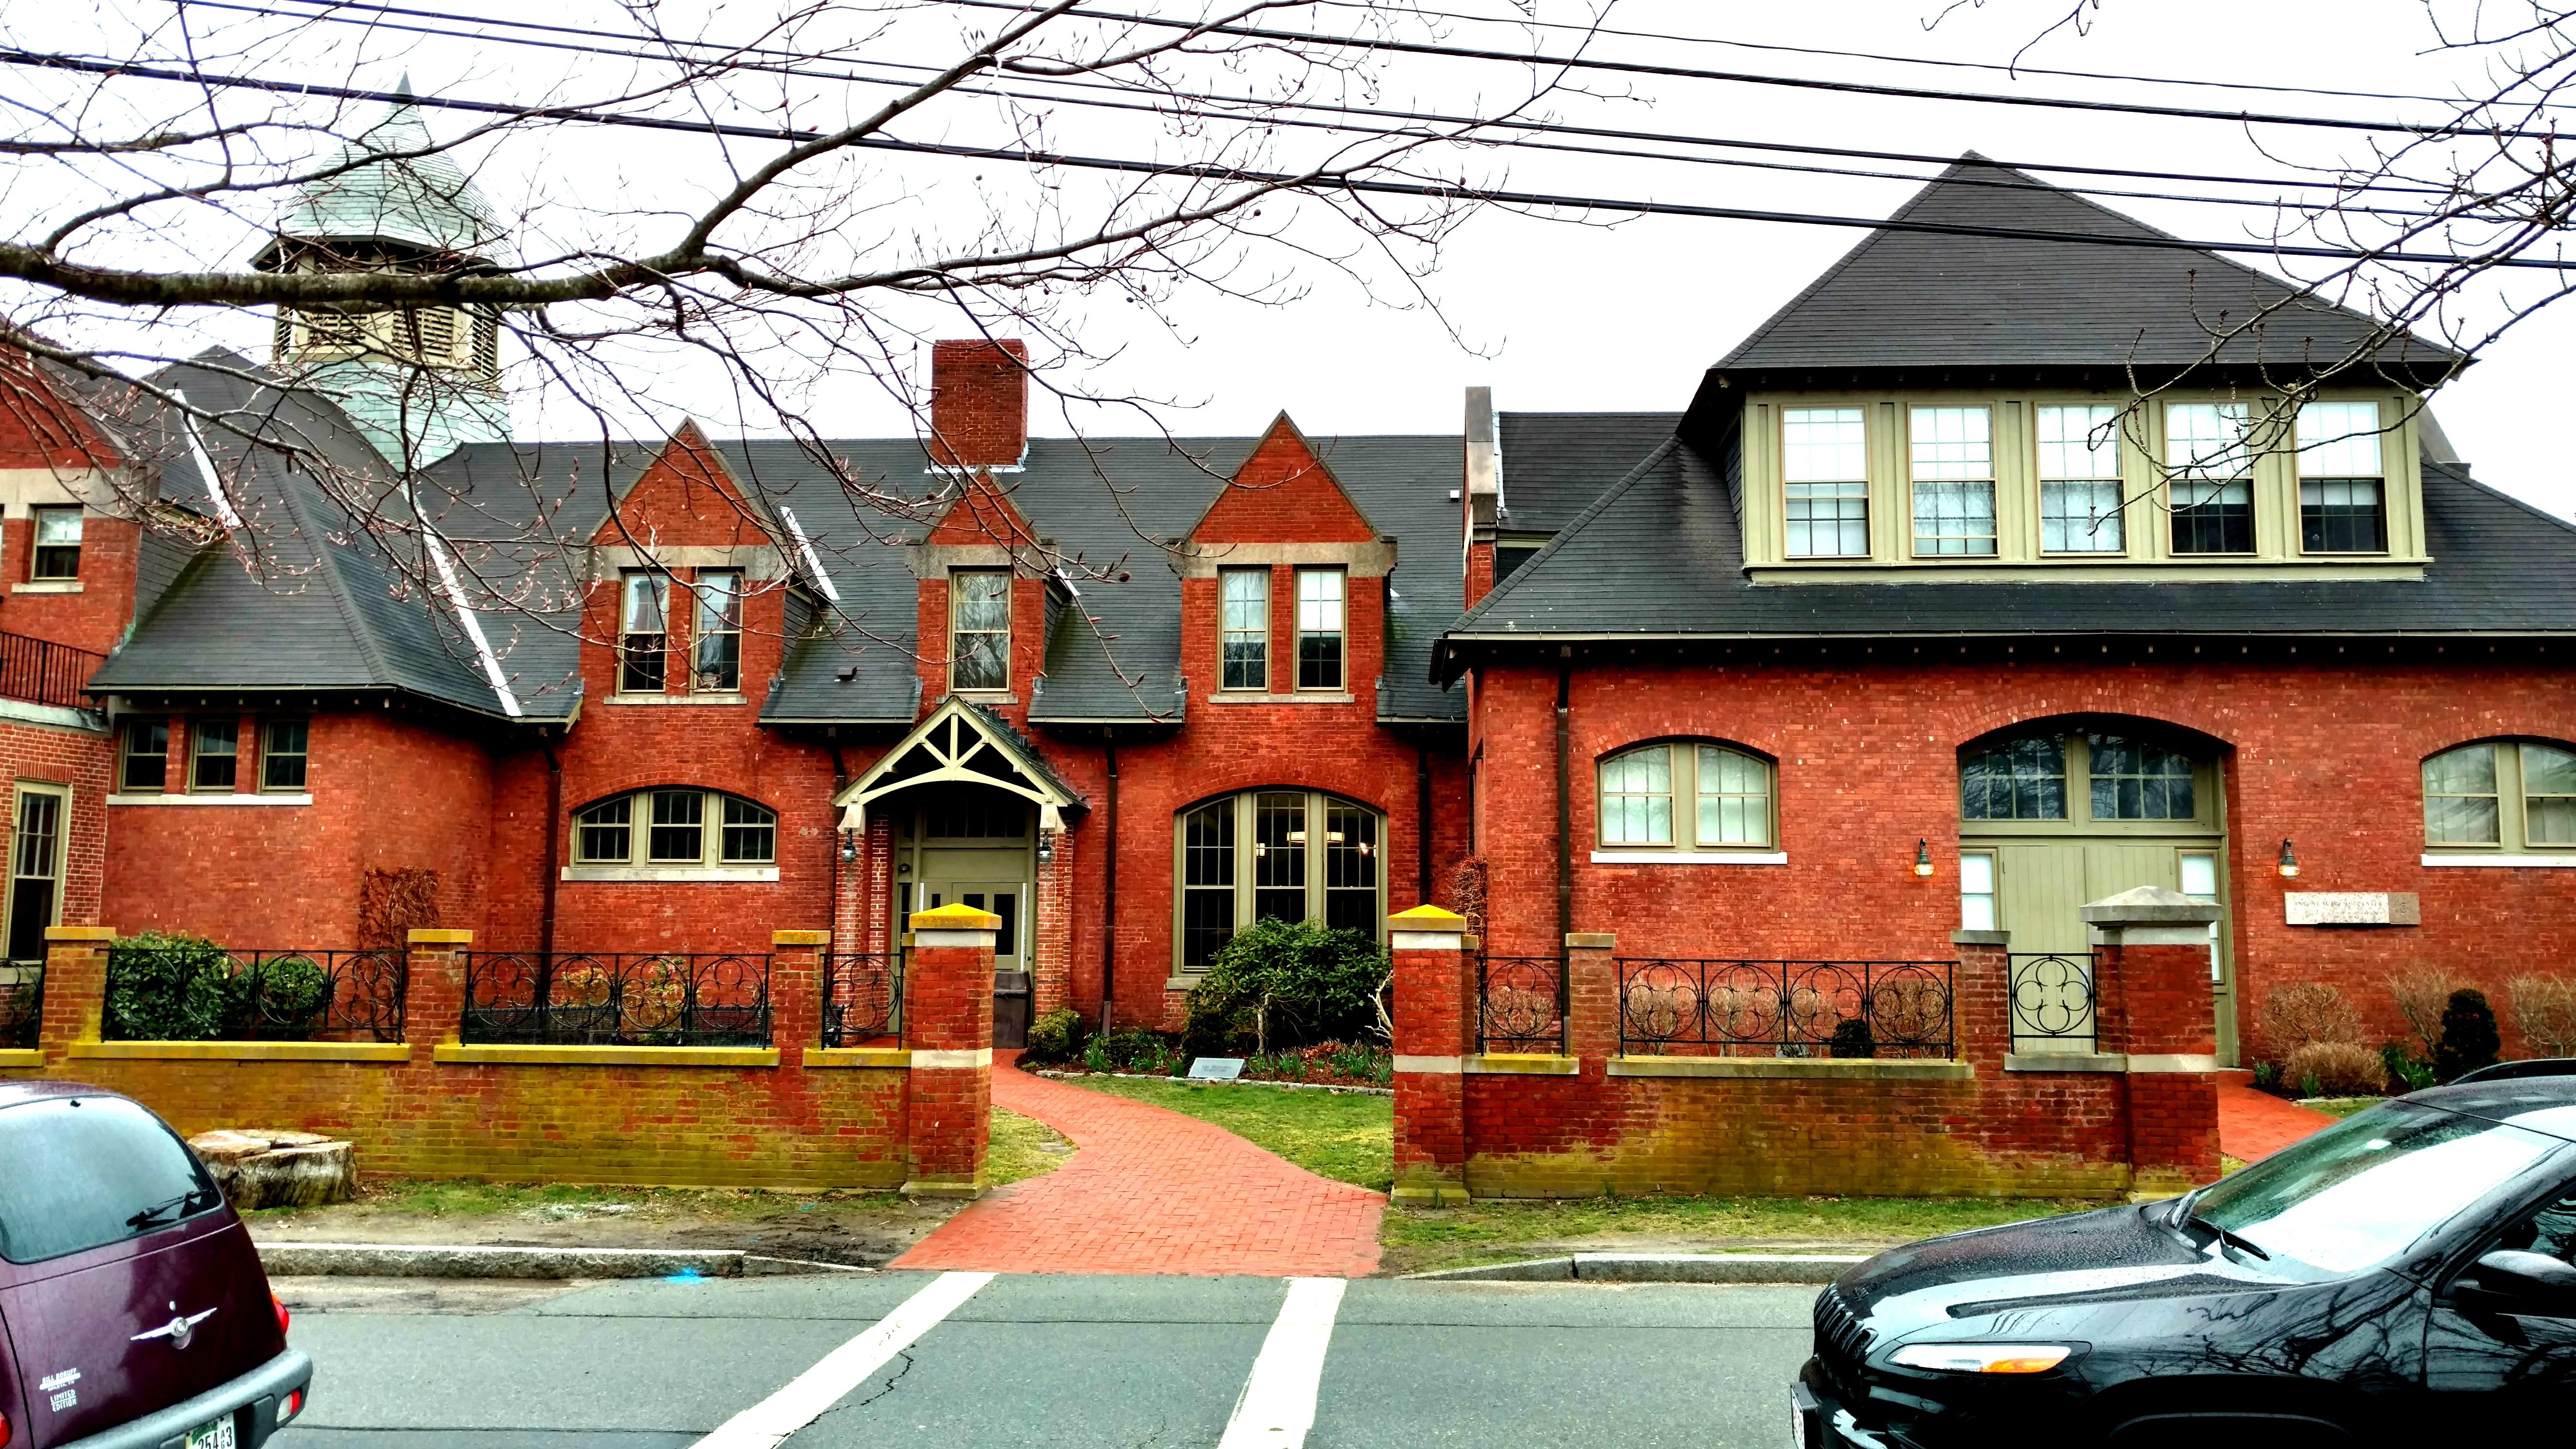 Exterior of Antone Academic Center. Photo taken by Ellen Tuttle.